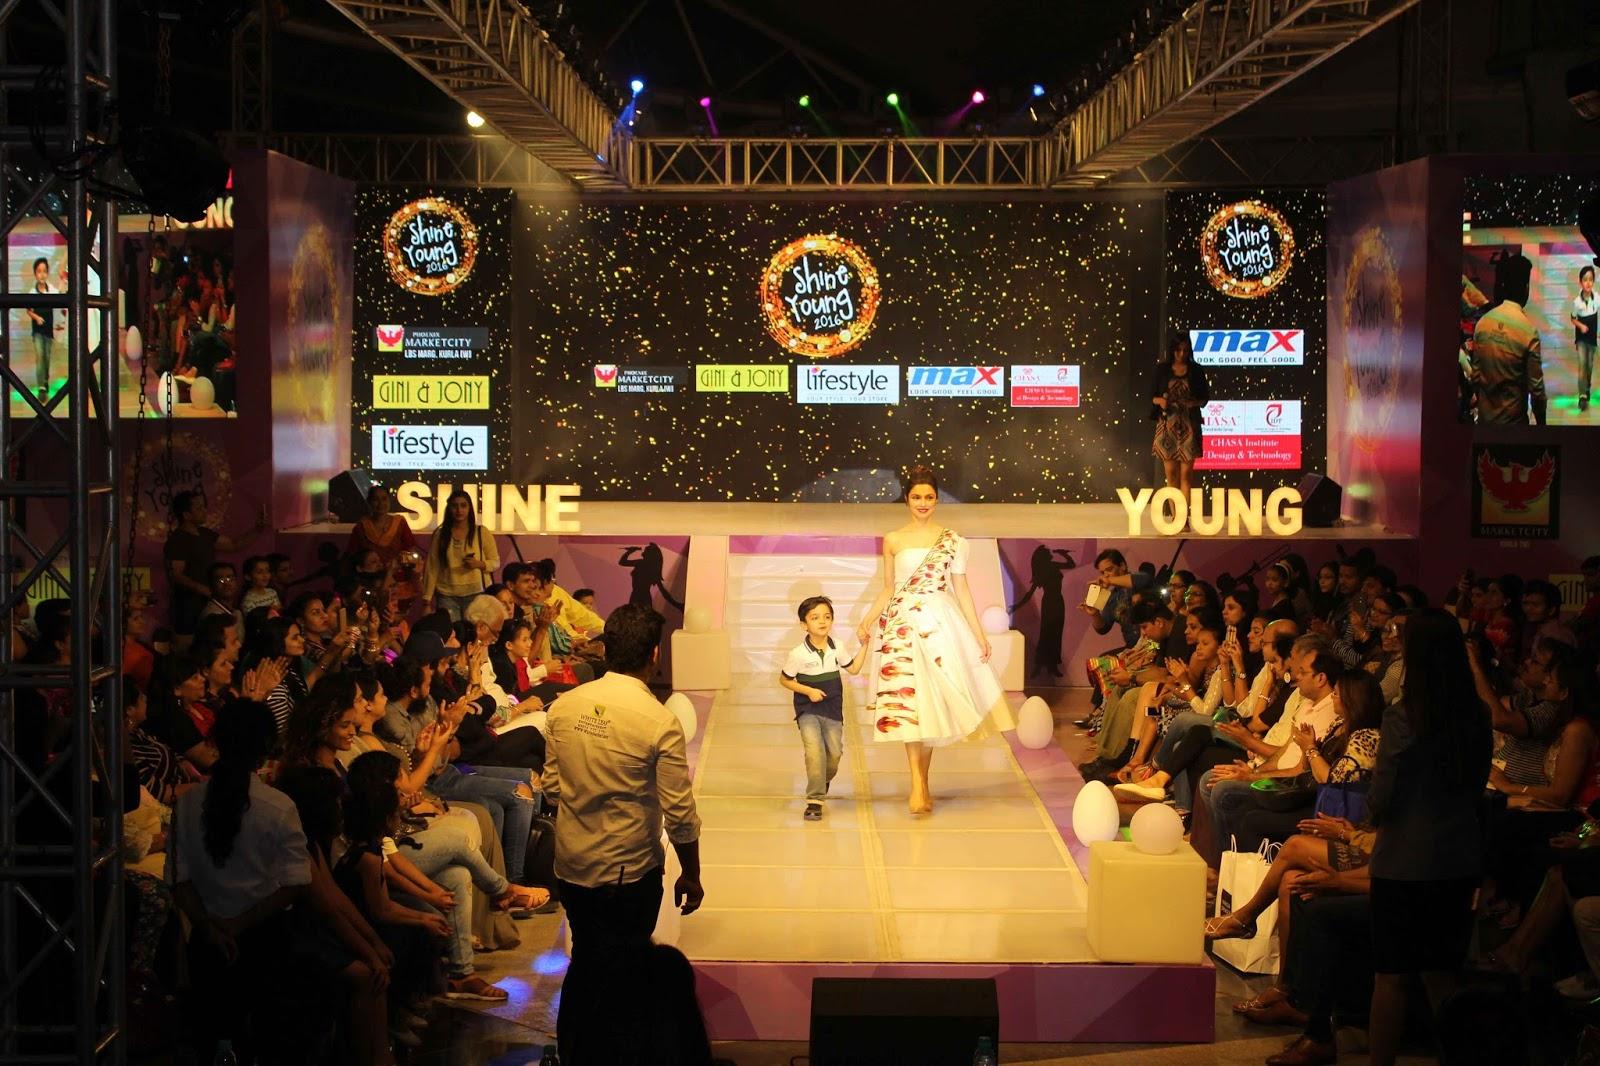 Divya Khosla Kumar with her son, Divya Khosla feet, Divya Khosla hot pics